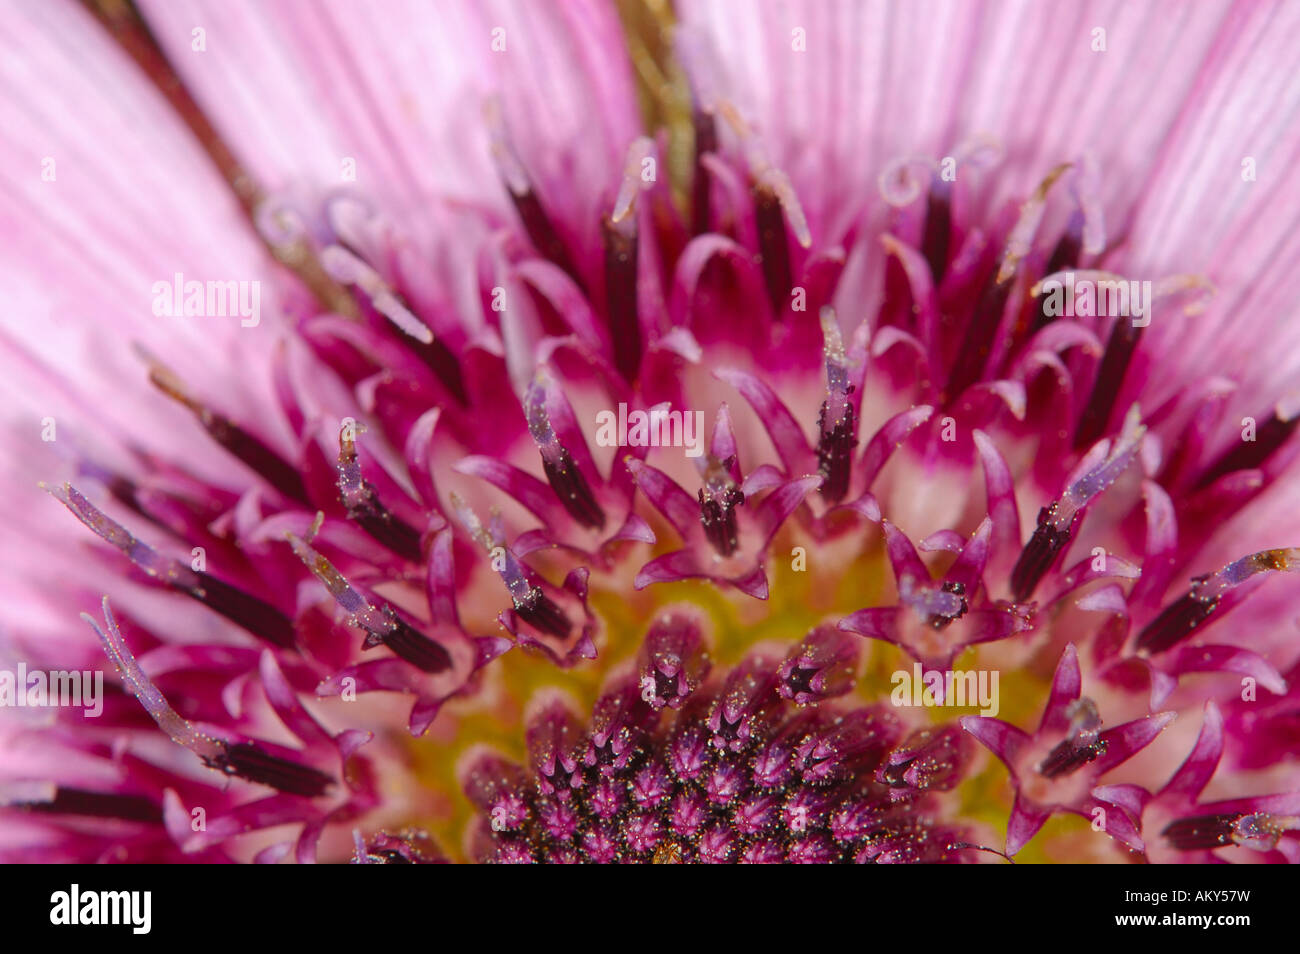 Berkheya purpurea, Asteraceae - Stock Image